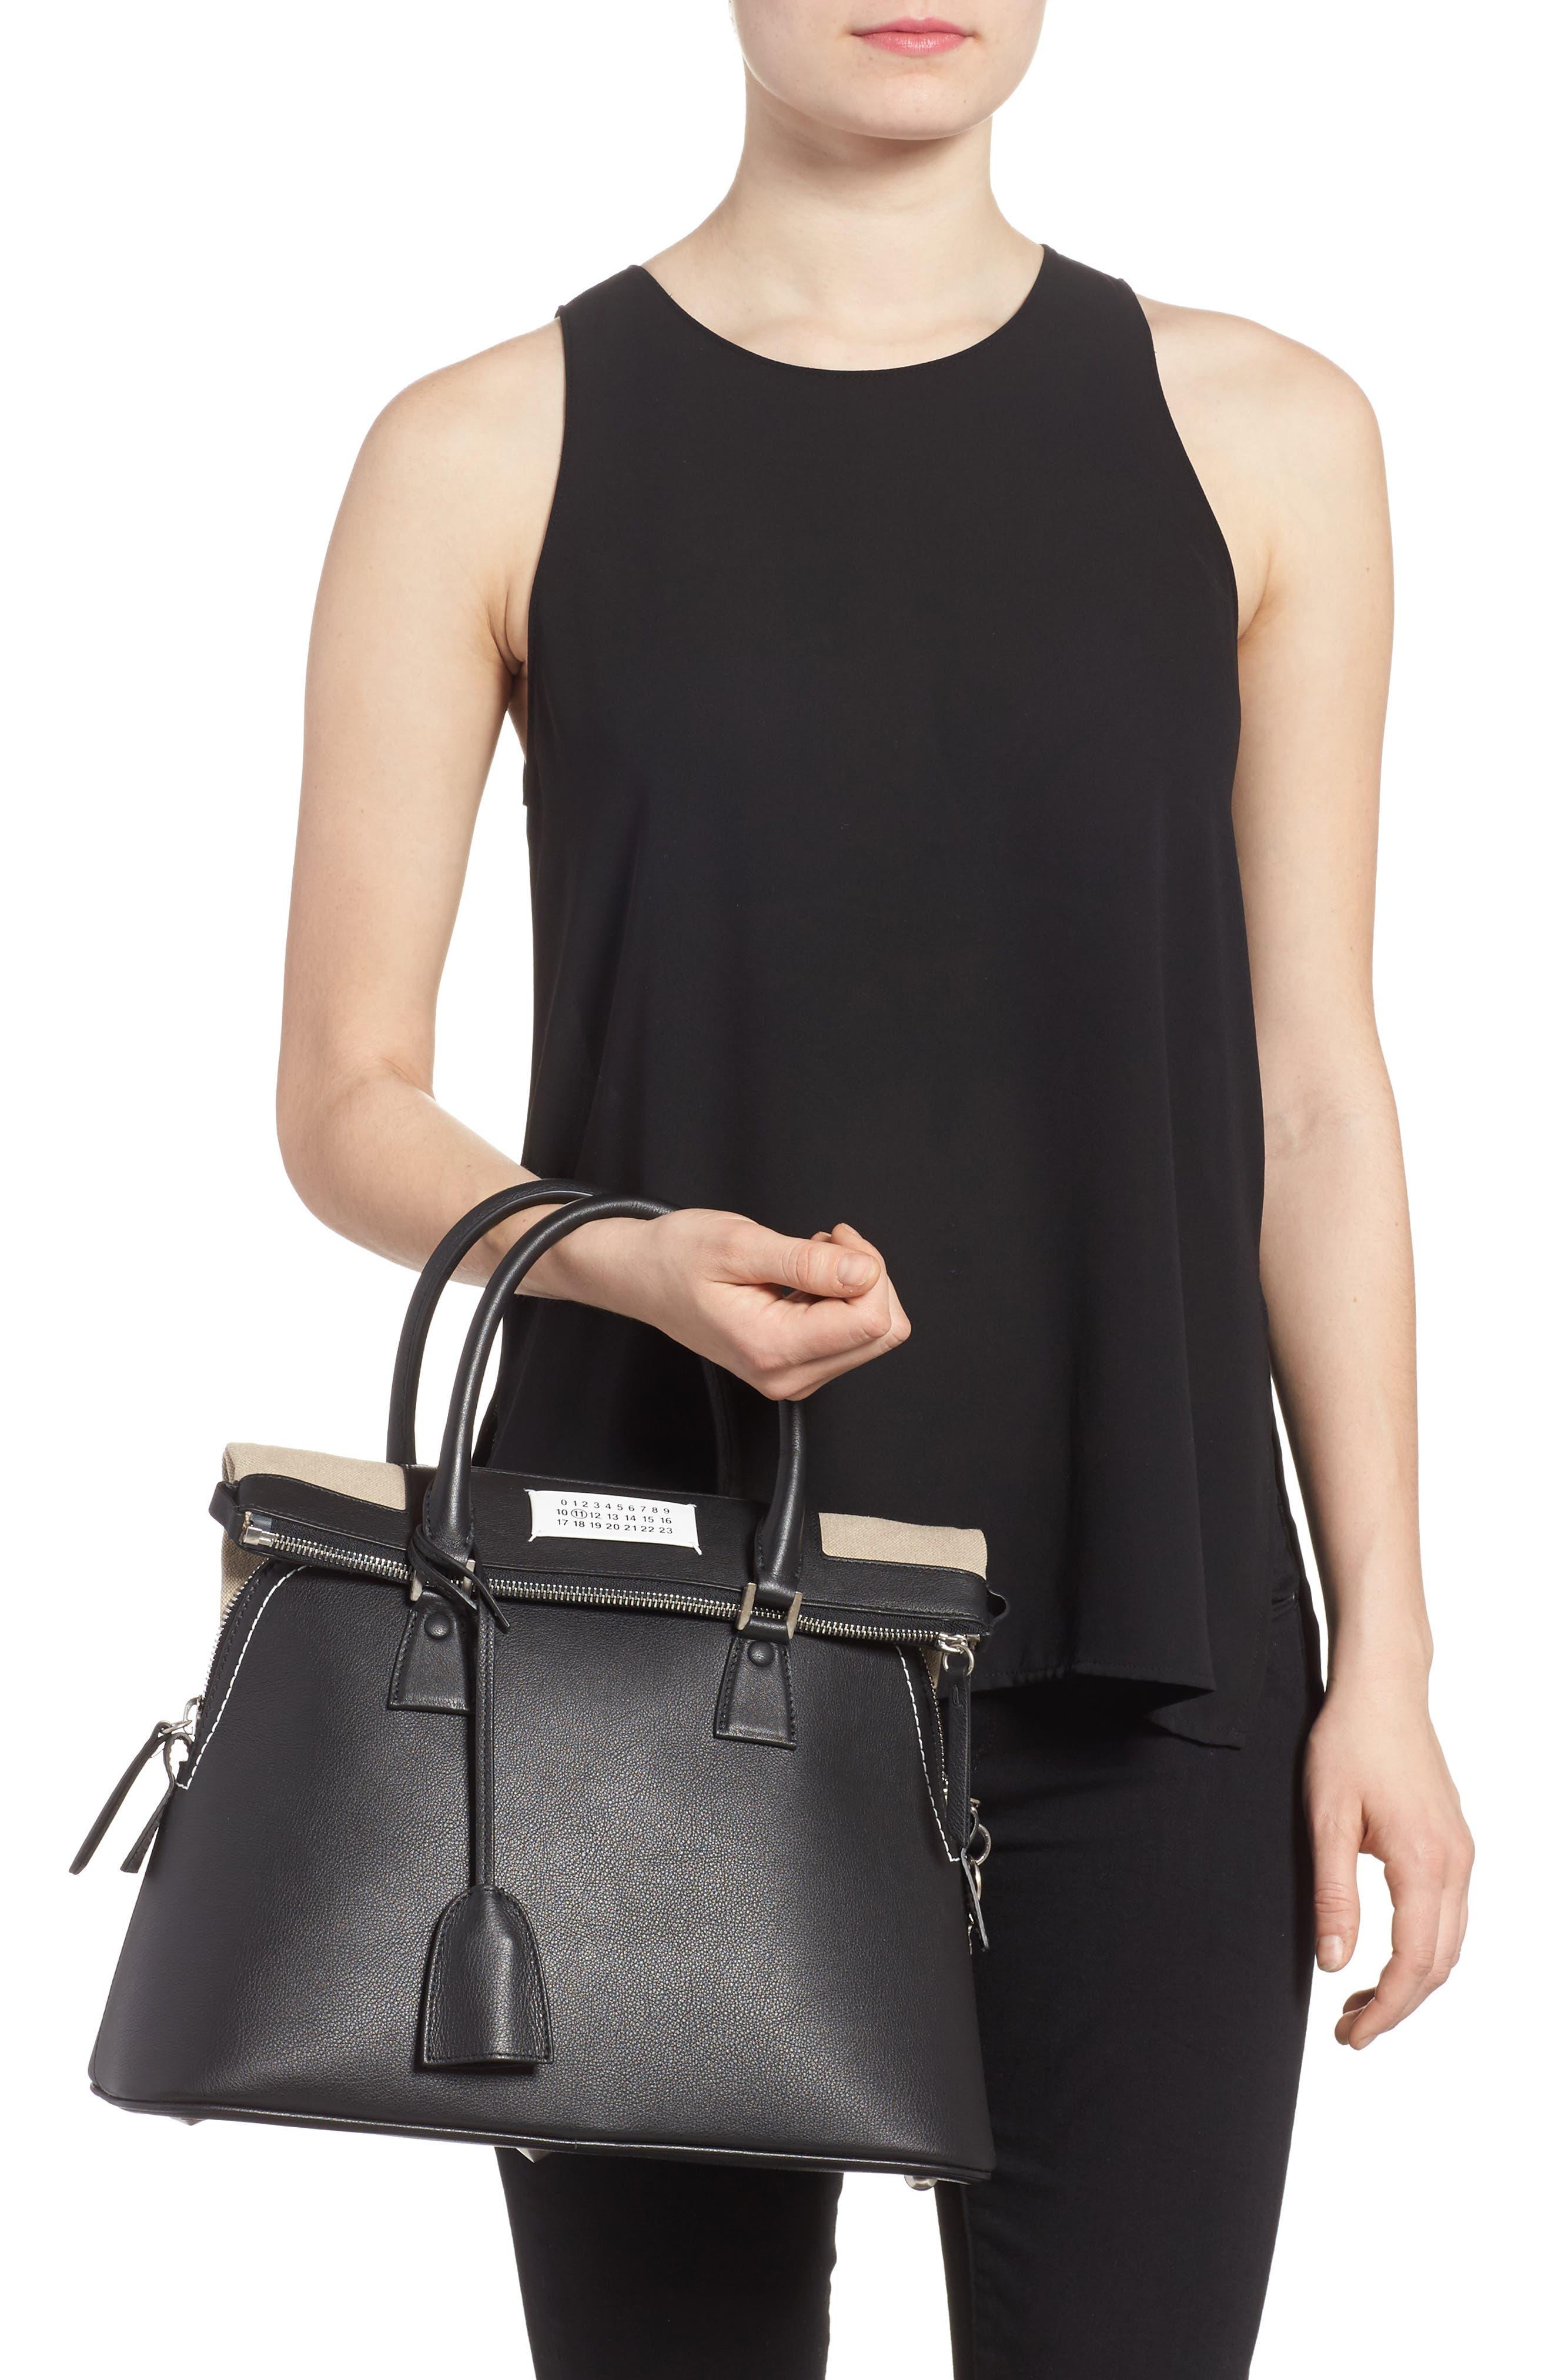 Medium 5AC Leather Handbag,                             Alternate thumbnail 2, color,                             001